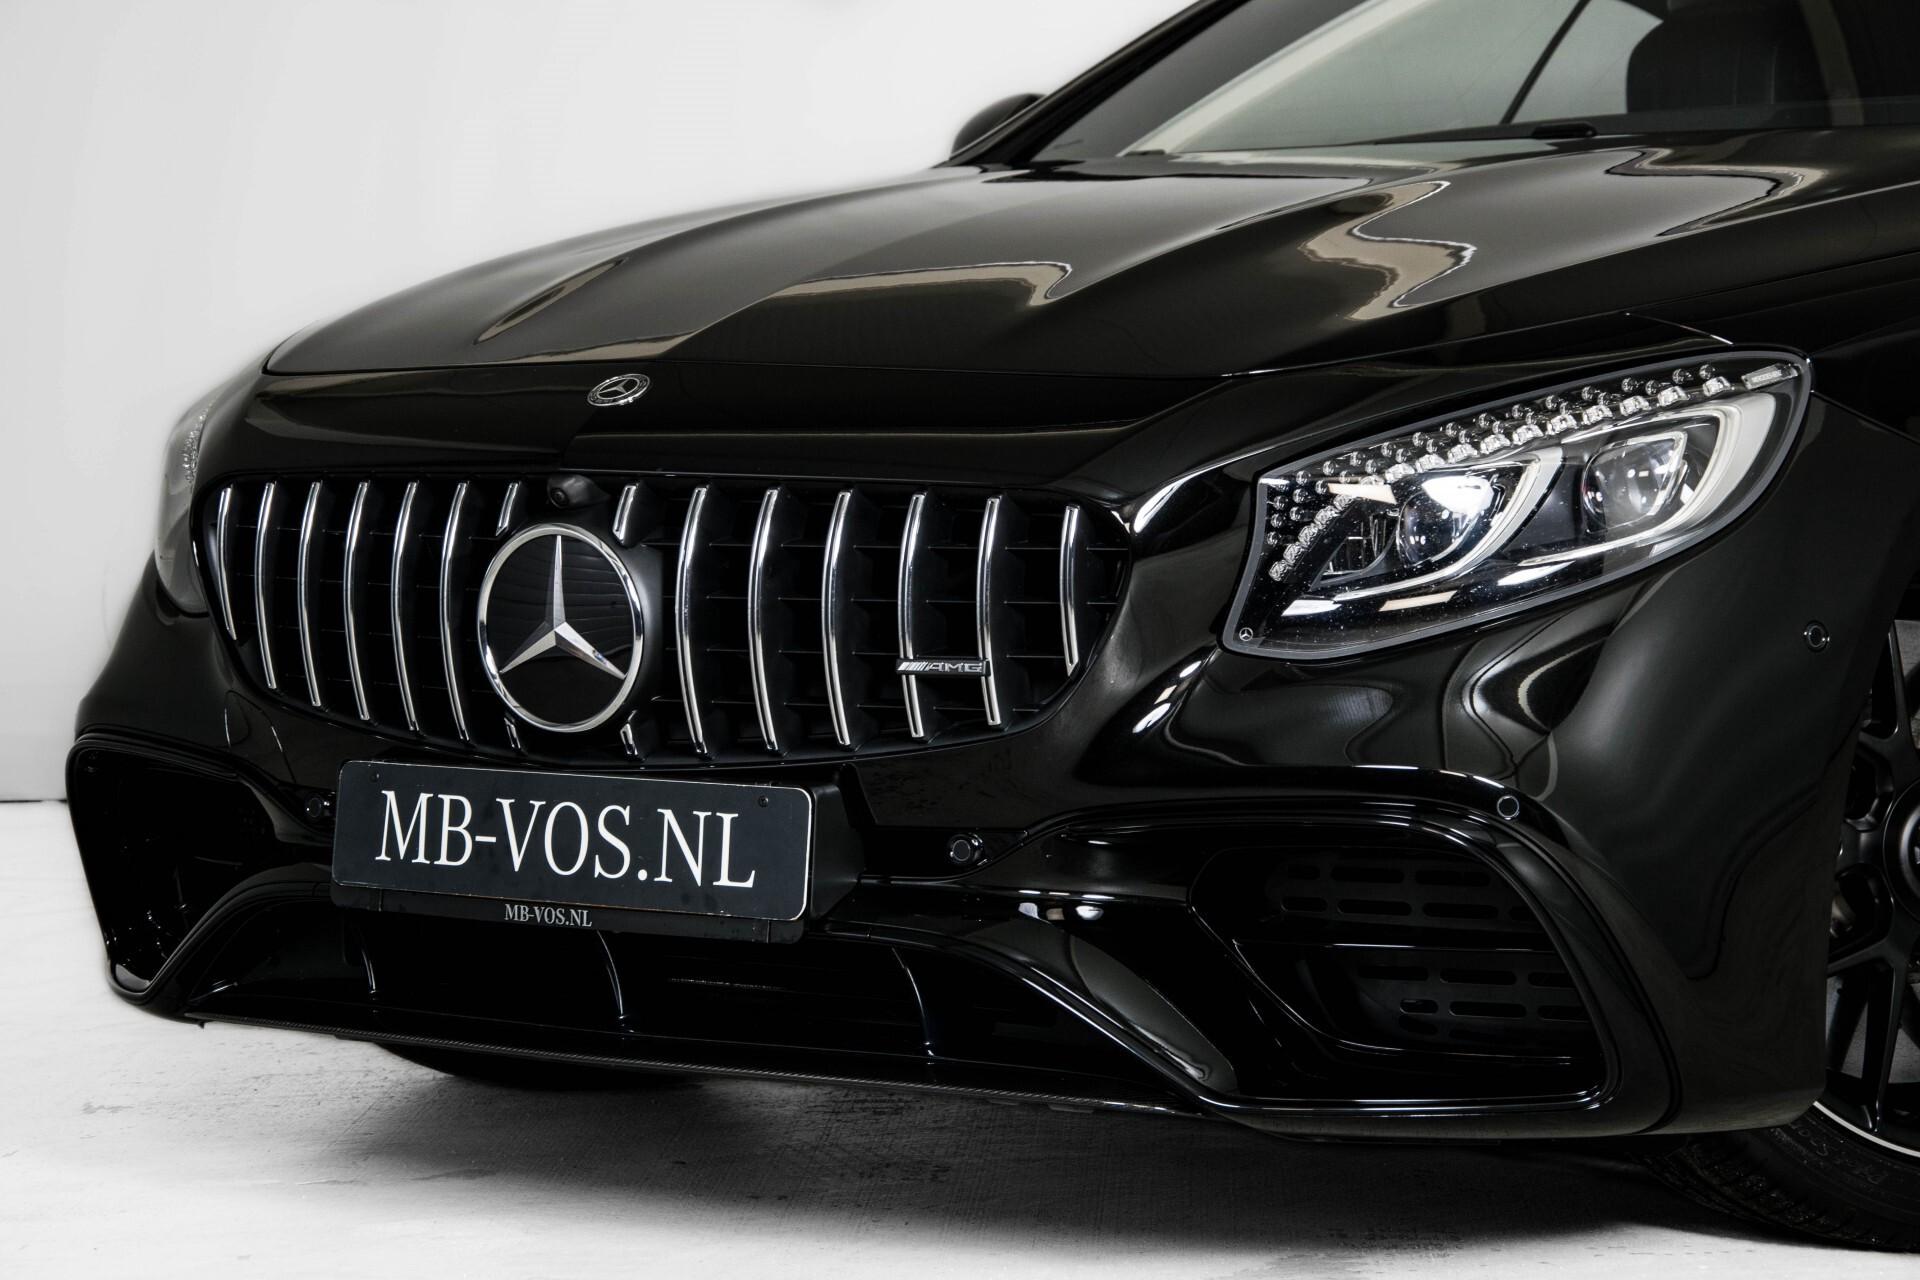 Mercedes-Benz S-Klasse Cabrio 63 AMG 4-M Ceramic/Designo/Carbon/Burmester High End Aut Foto 67